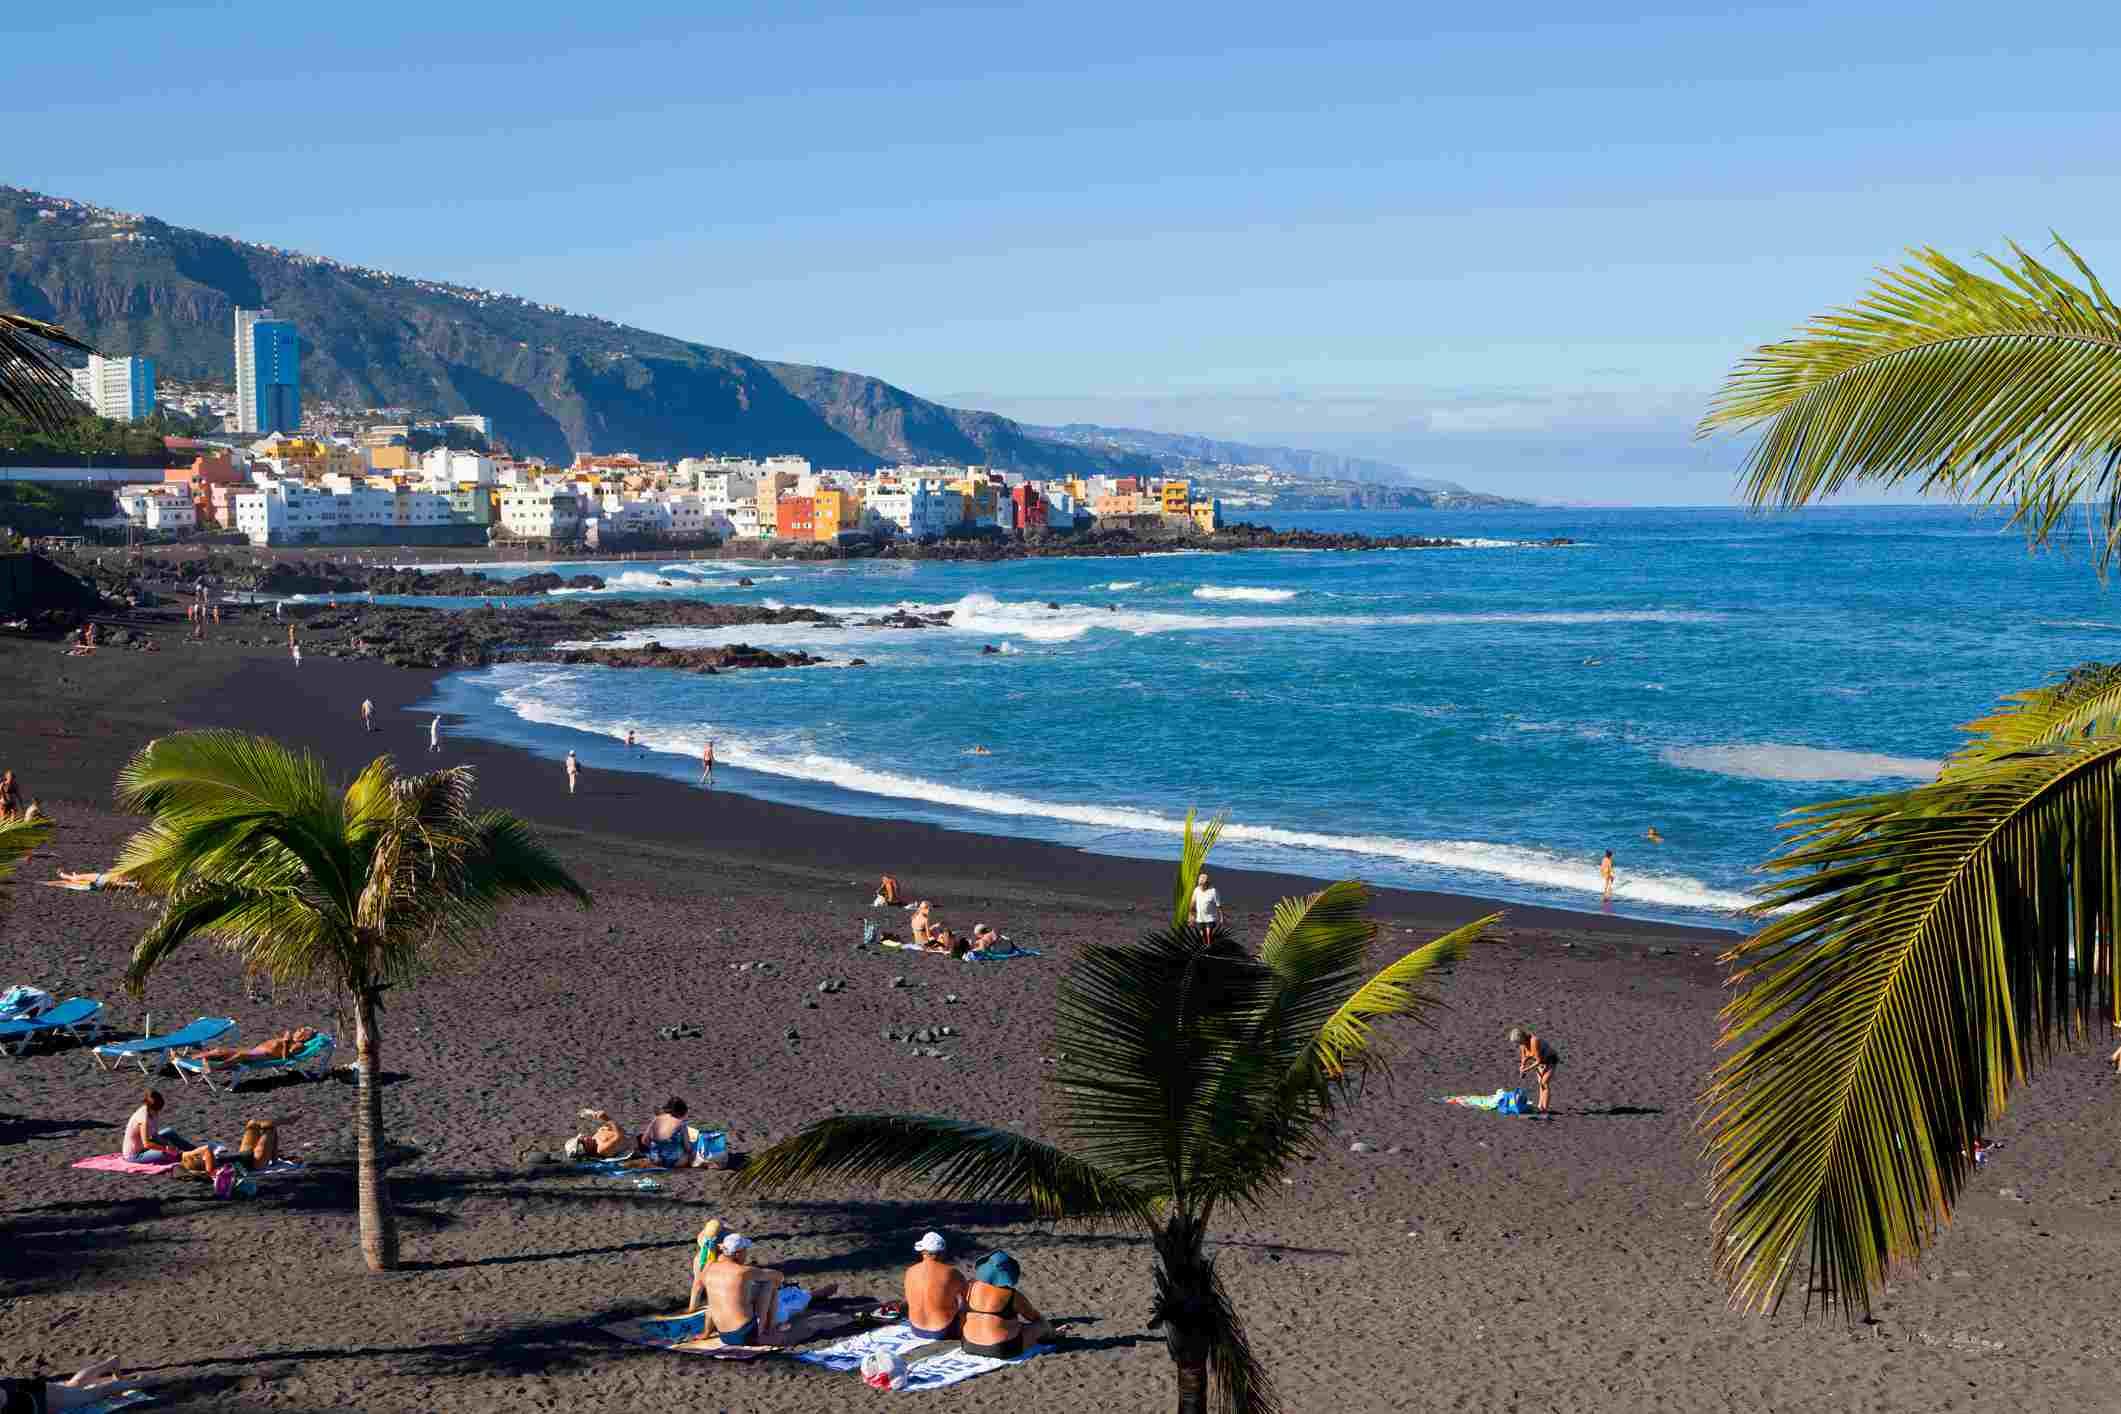 Black sand beach, Playa Jardin, in Puerto de la Cruz, Tenerife